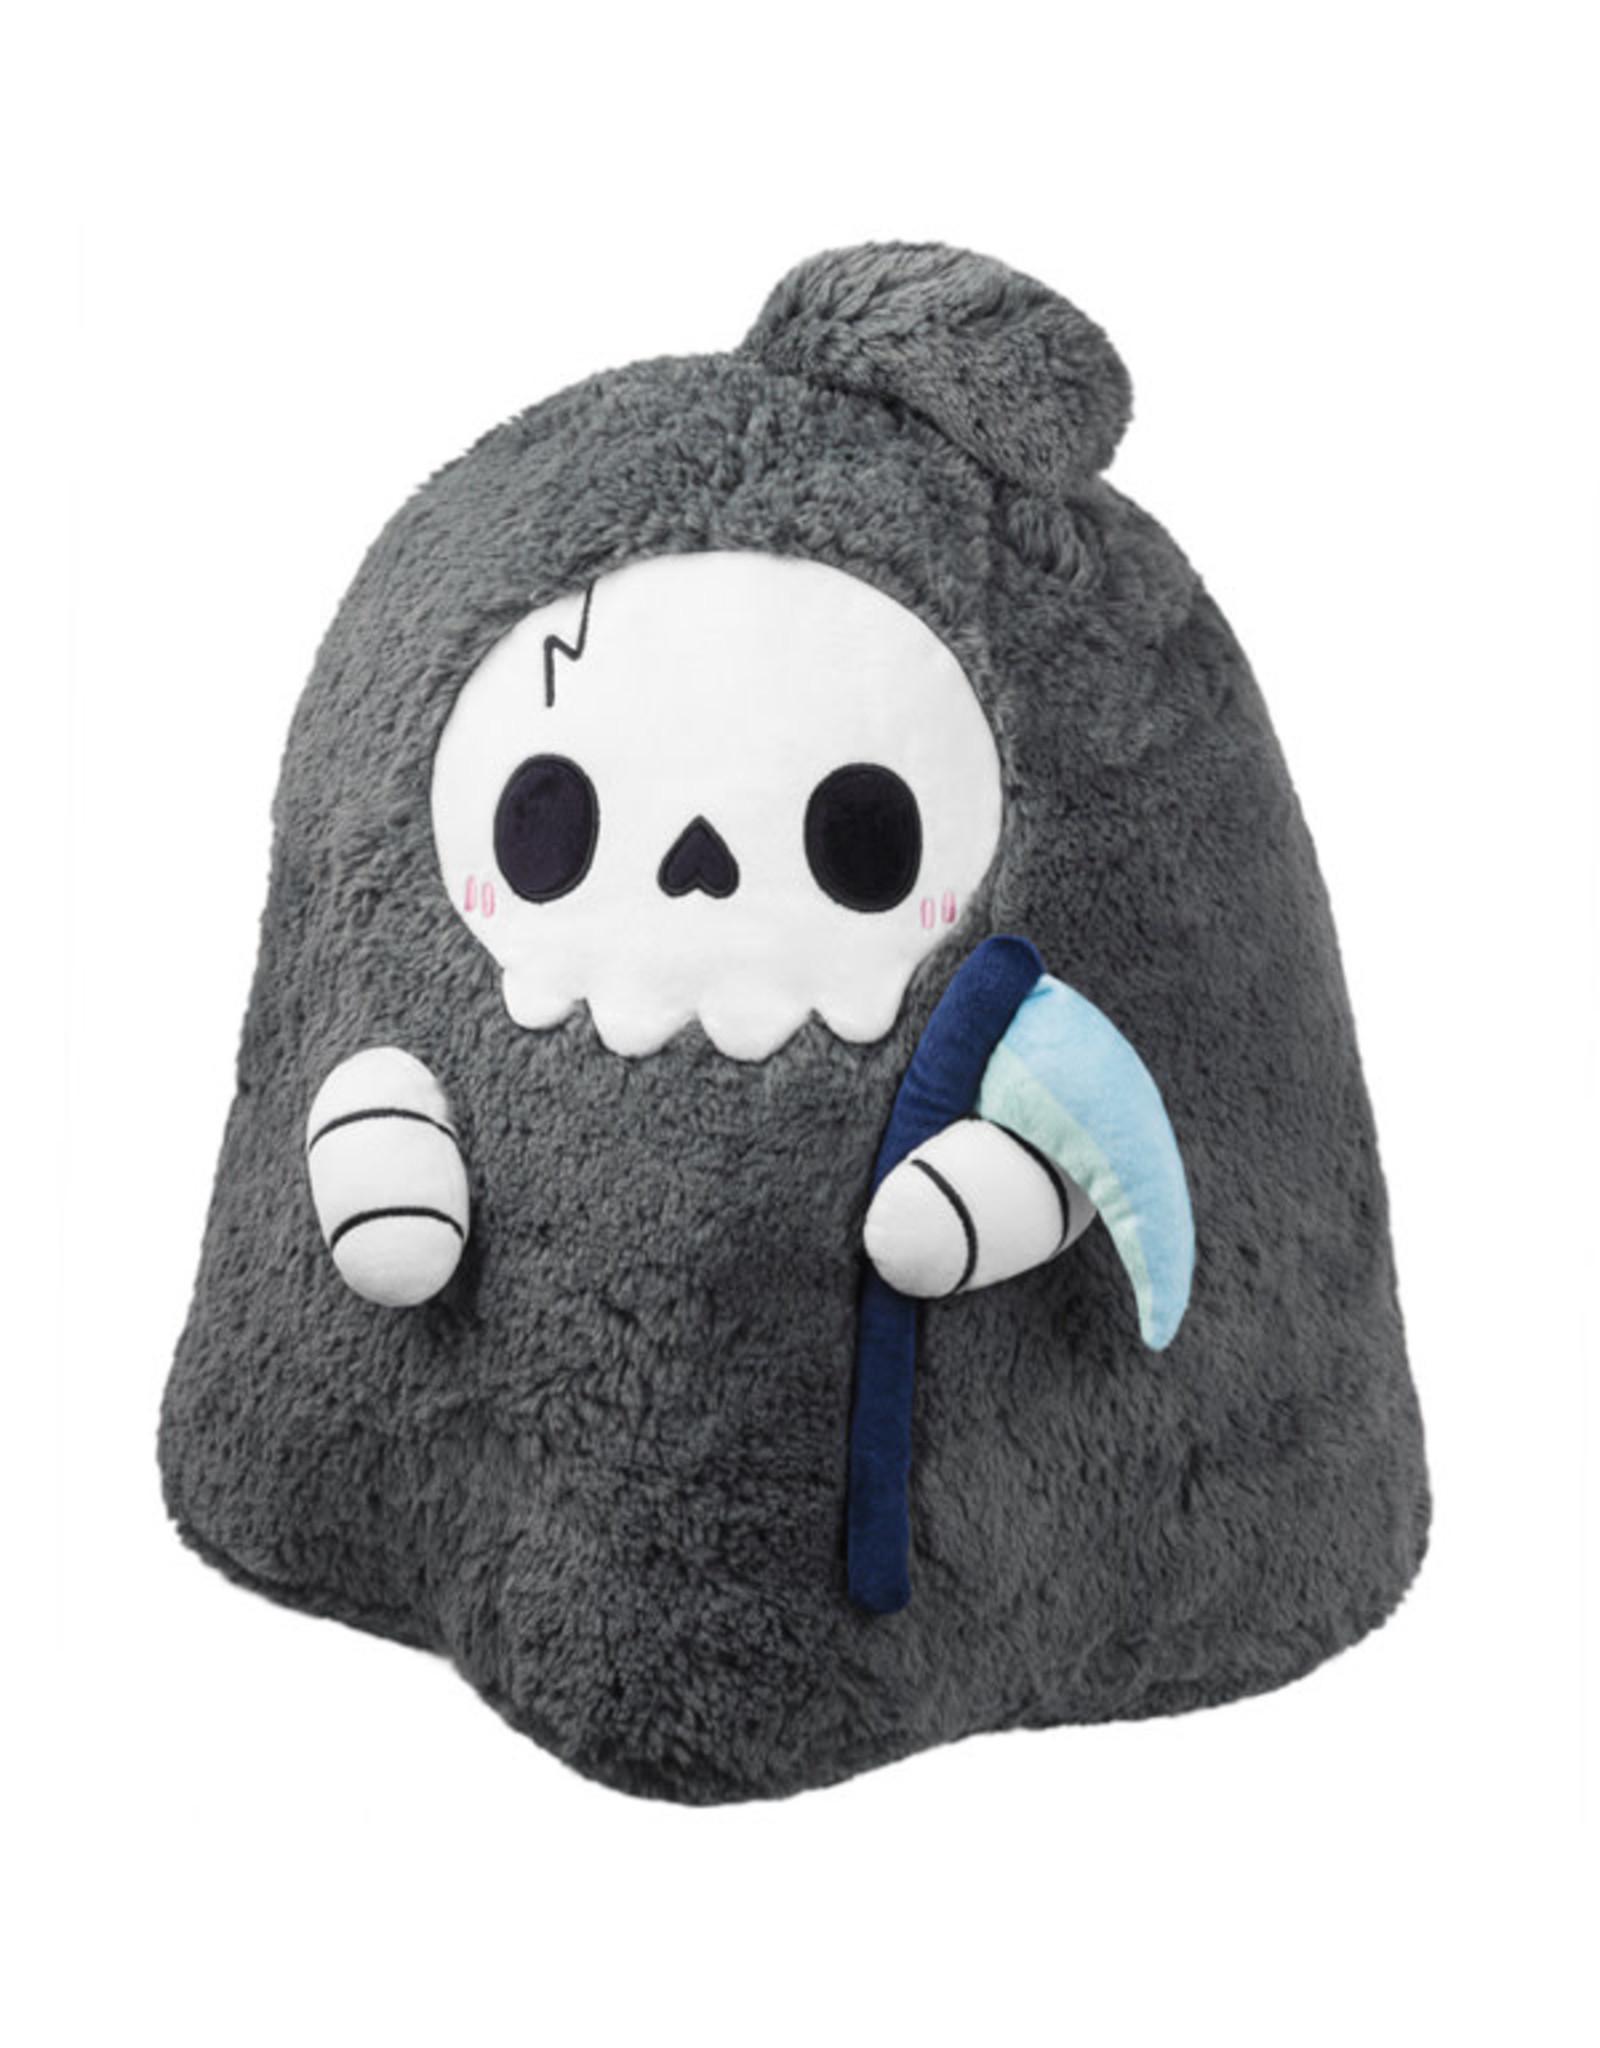 Squishable Mini Squishable Grim Reaper